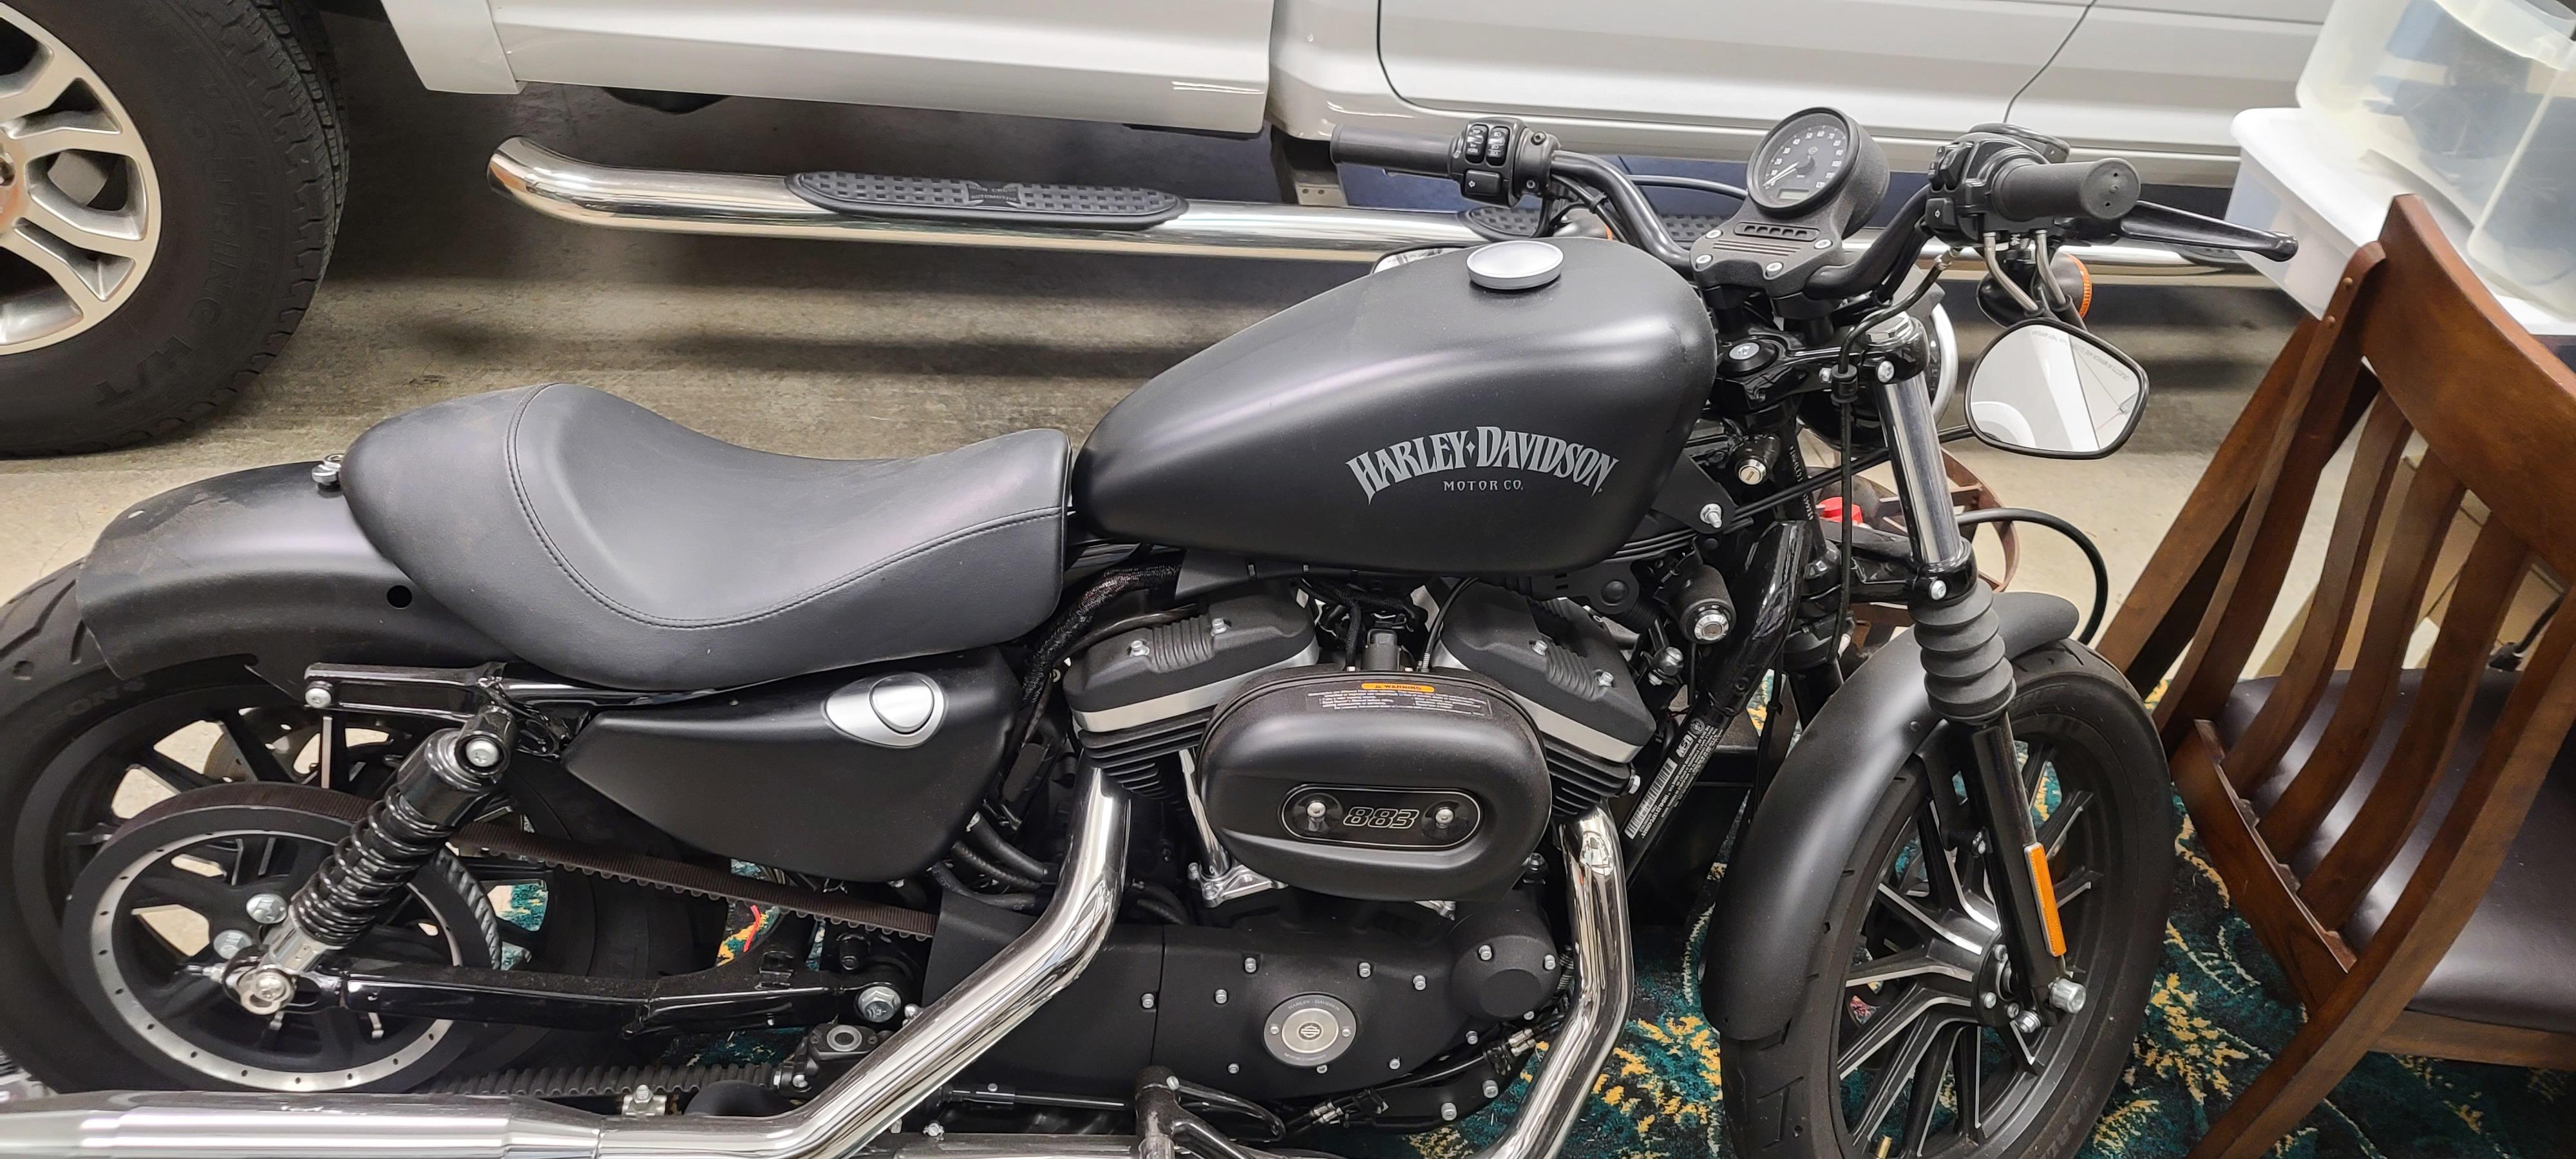 Photo 2015 Harley-Davidson SPORTSTER 883 IRON $6500164.45164.45